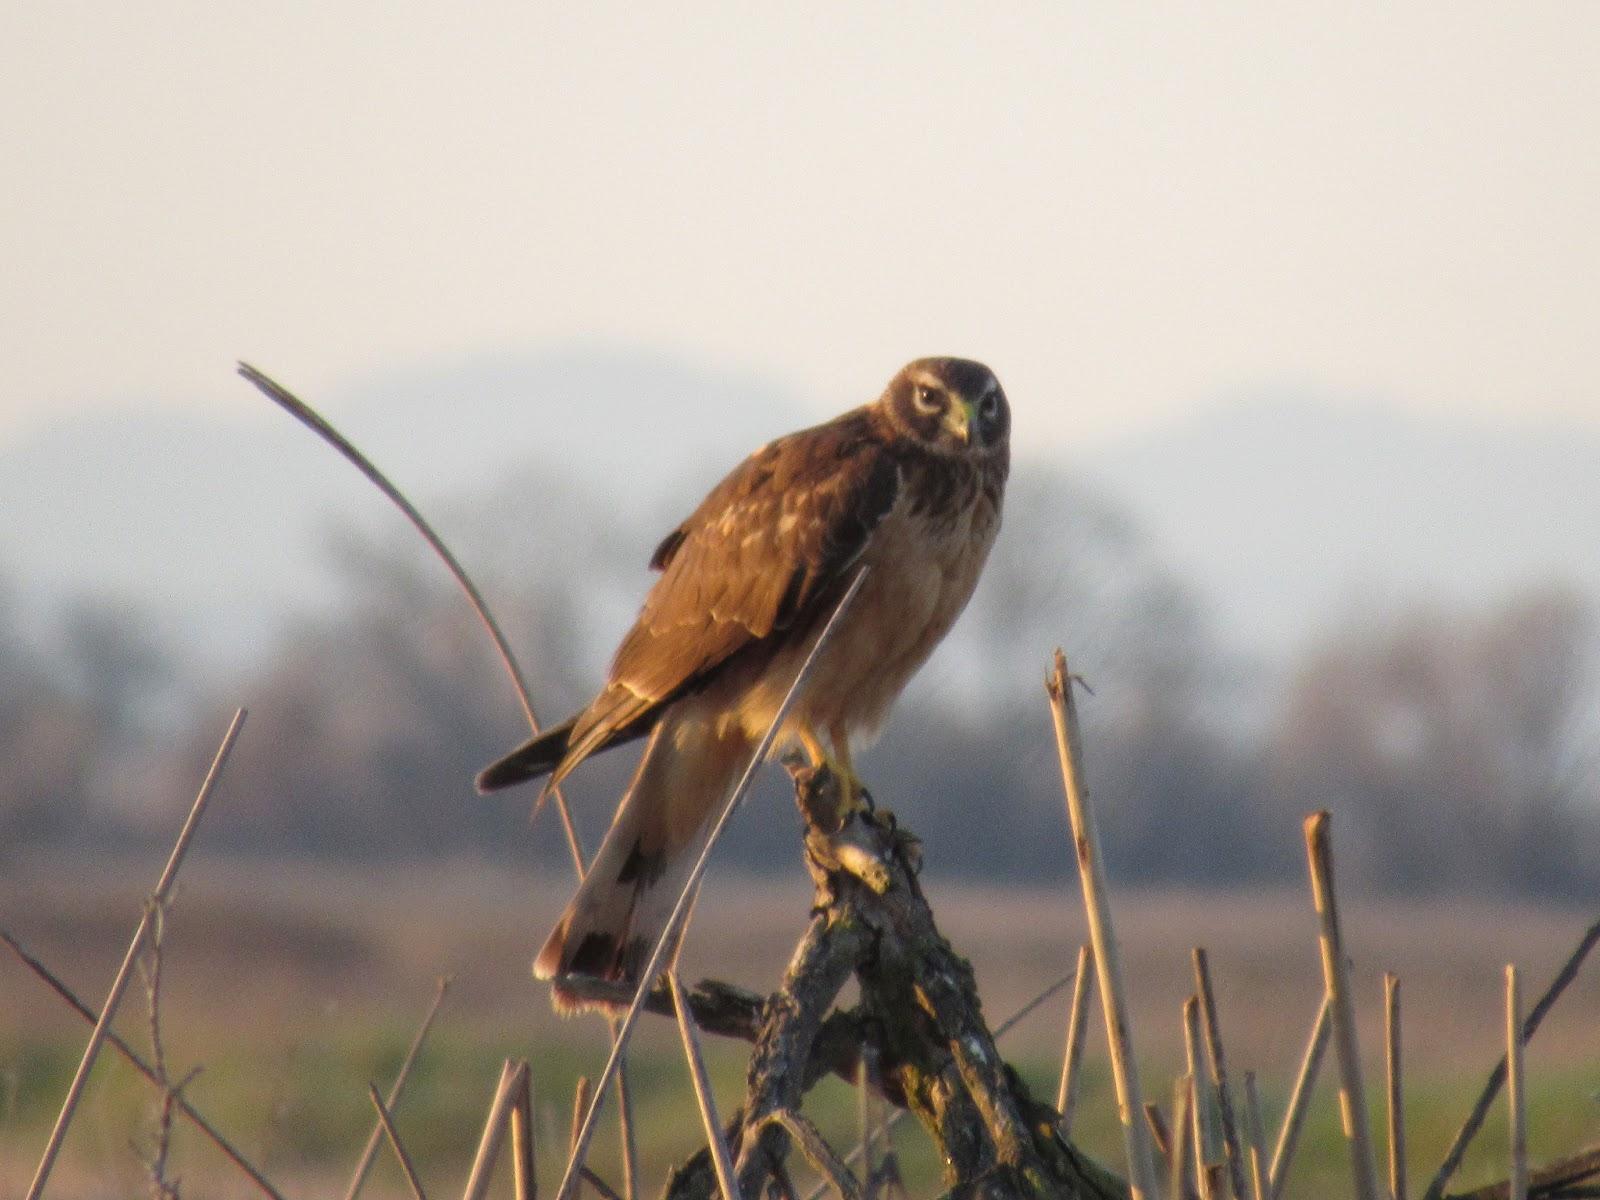 Wings And Daydreams Birds Of Prey Sacramento National Wildlife Refuge Auto Tour